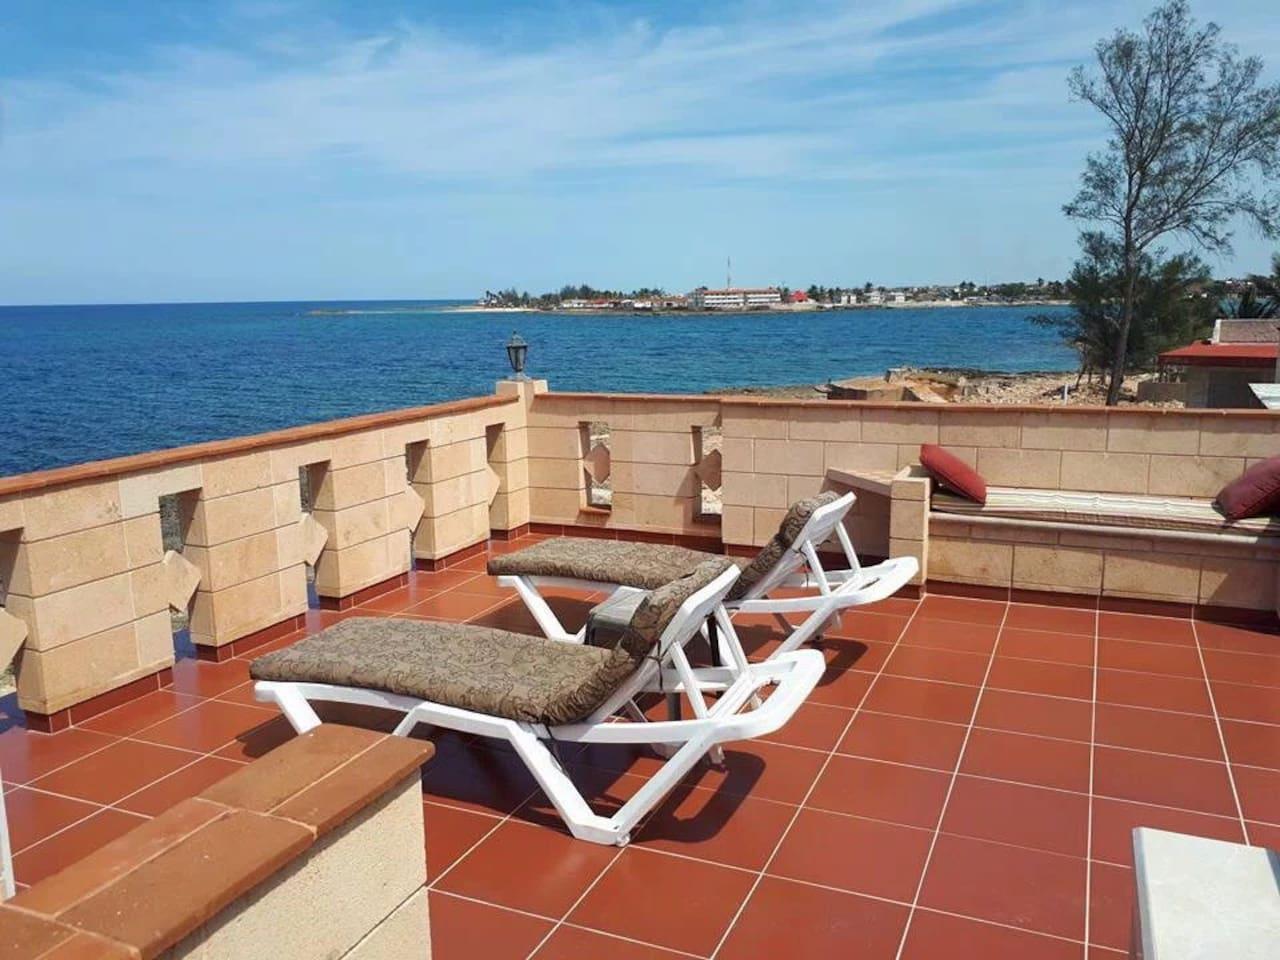 Apartment Casa Oceanview 3 - Luxury   Amazing View photo 23378348